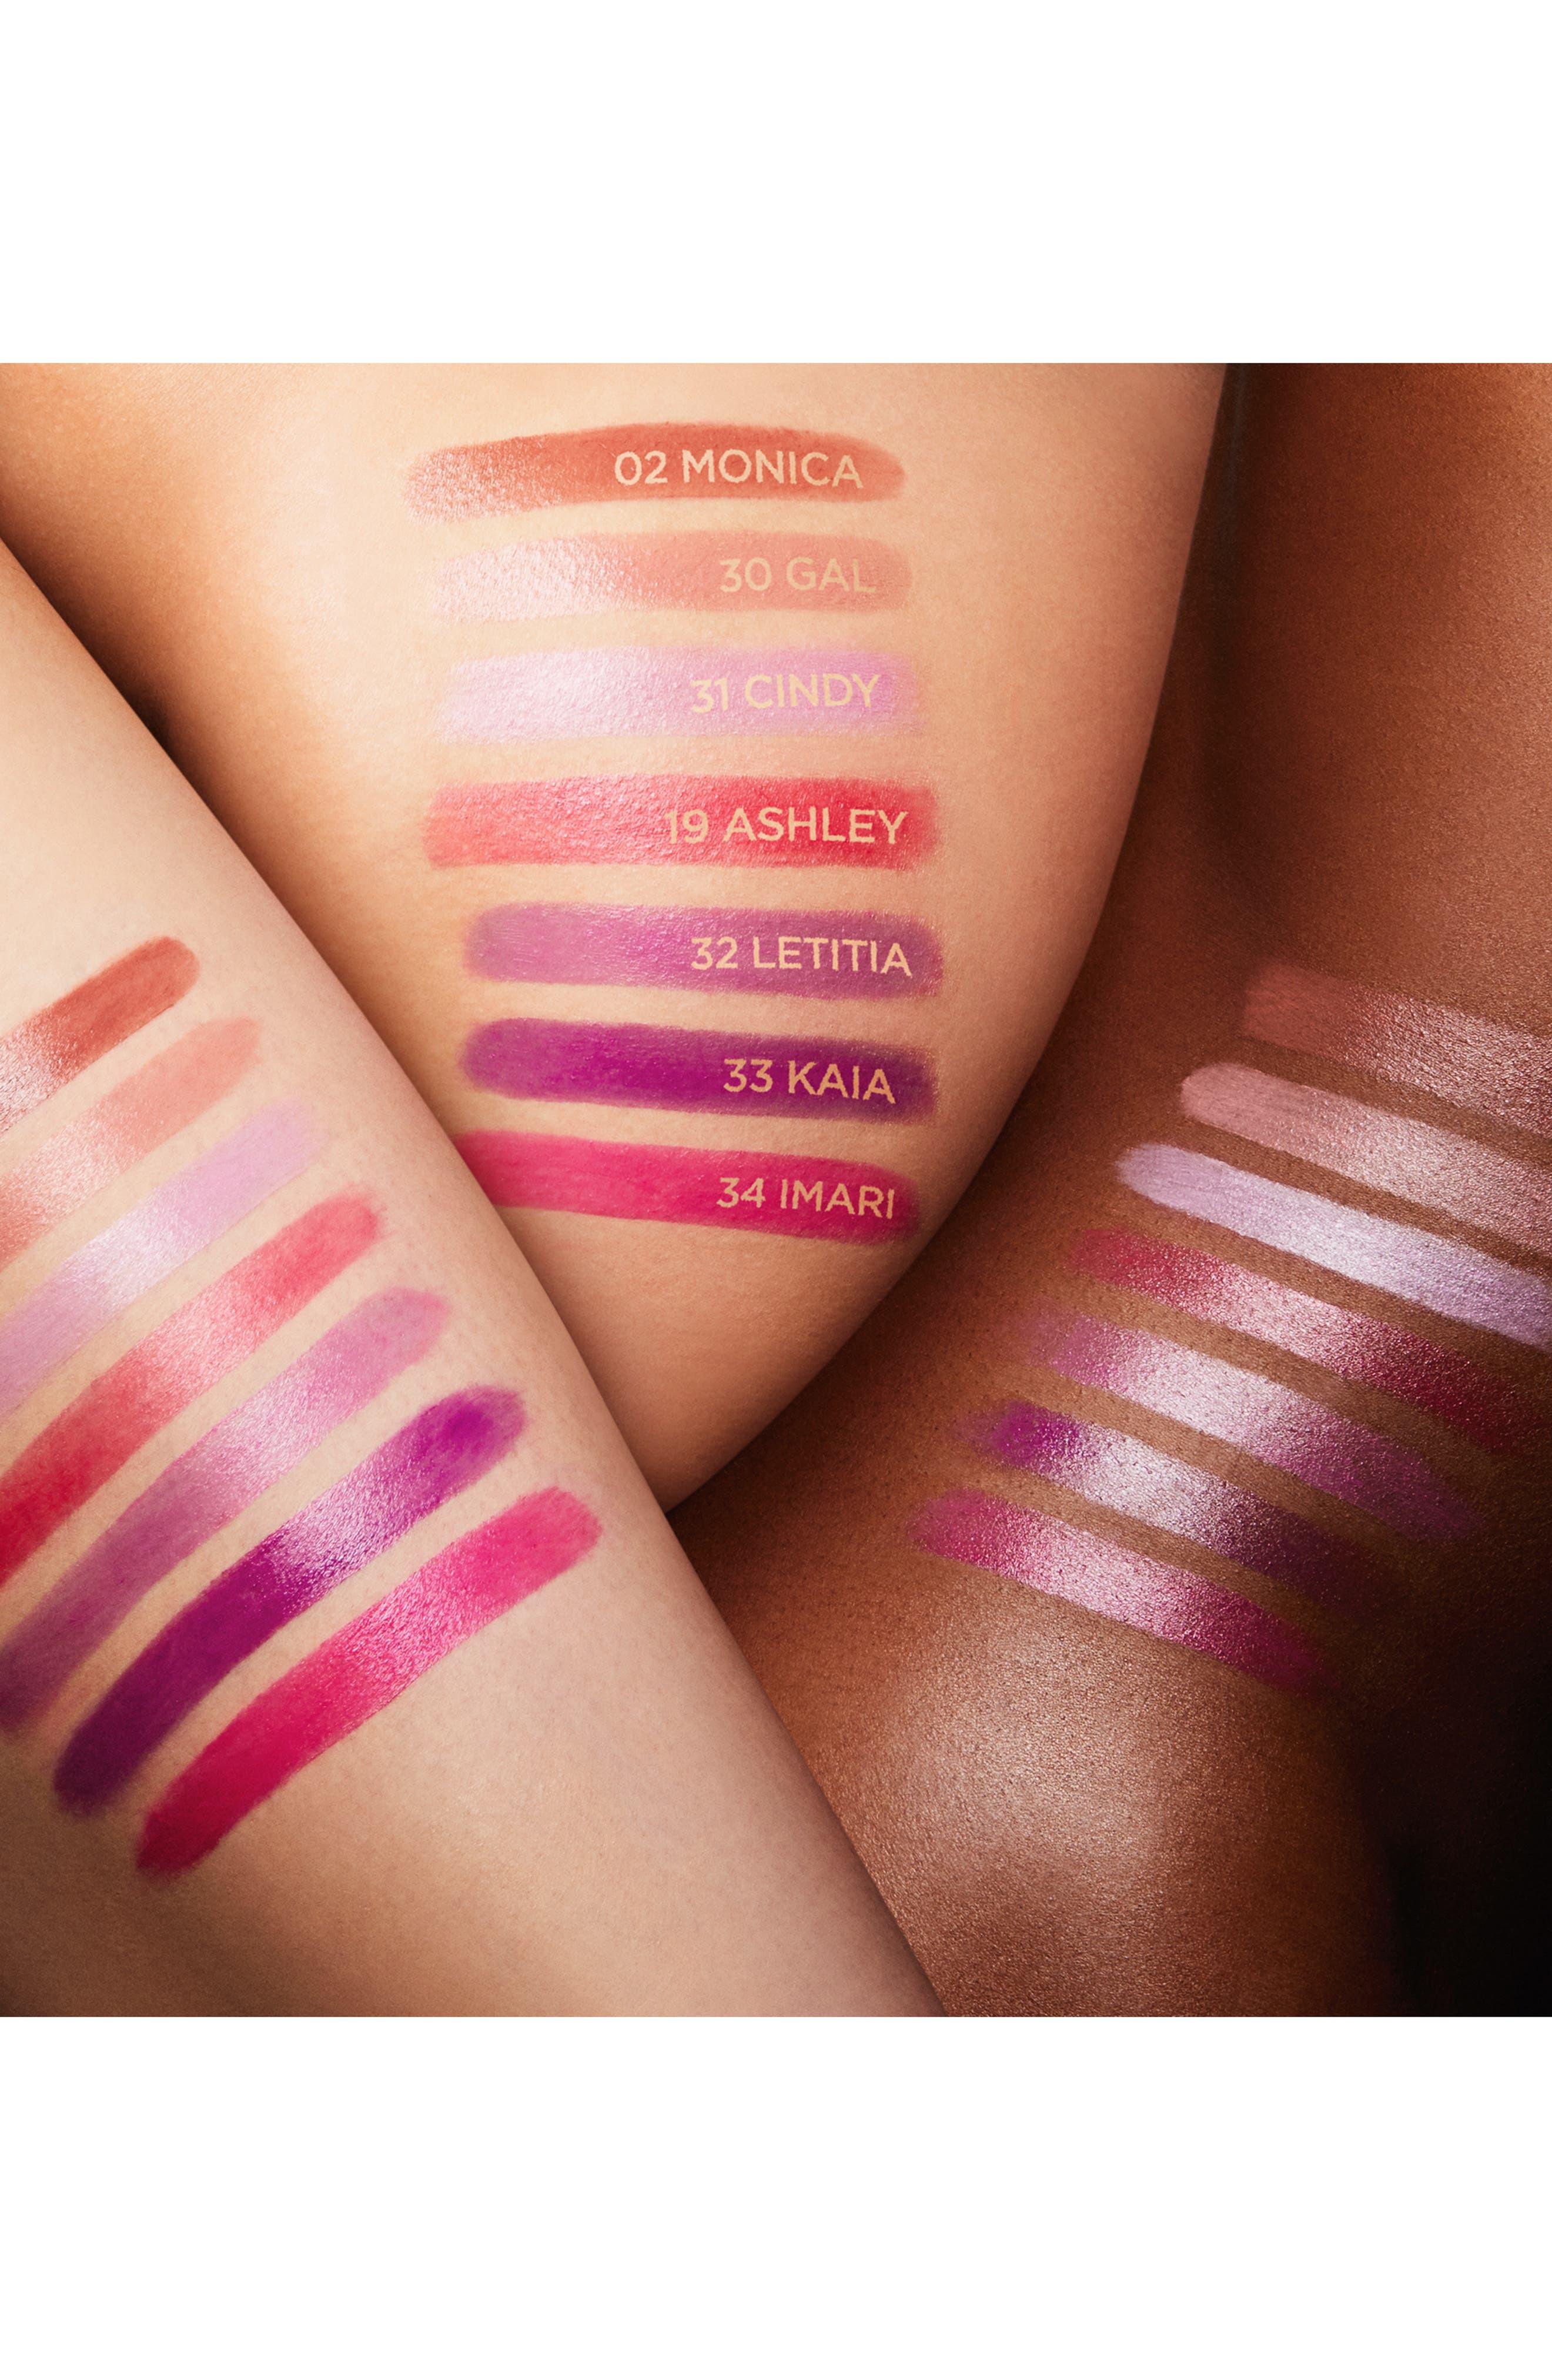 Boys & Girls Lip Color - The Girls,                             Alternate thumbnail 2, color,                             MONICA/ ULTRA-RICH